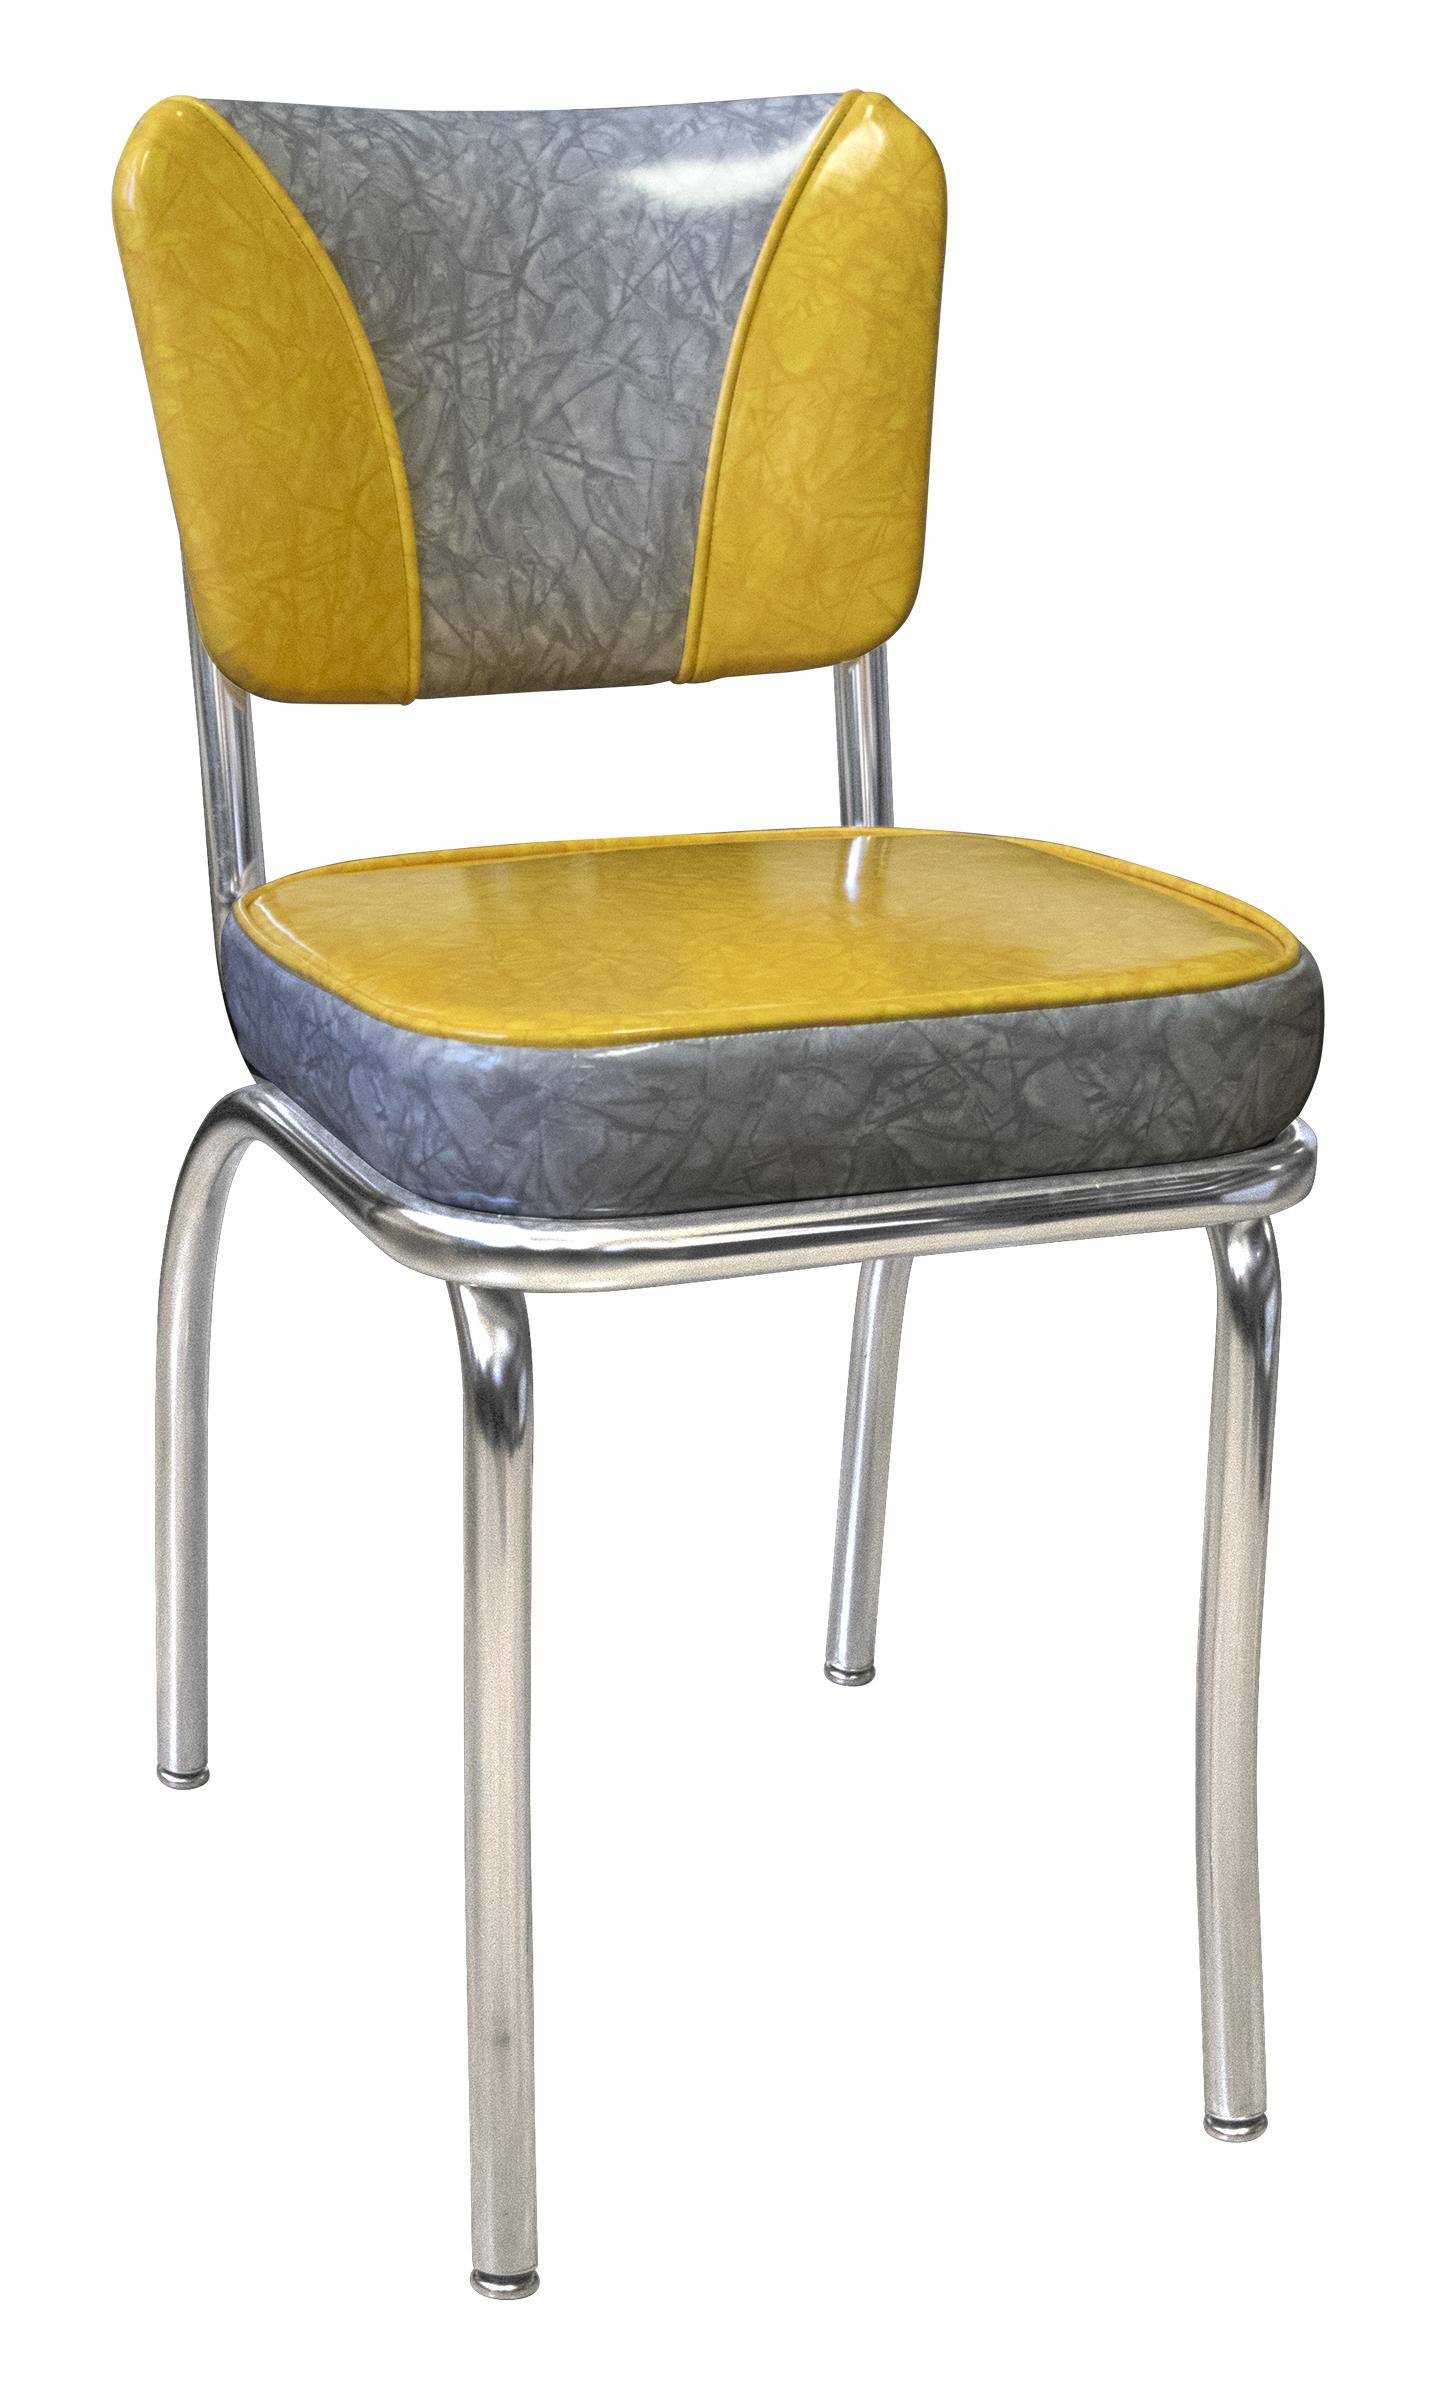 Retro Yellow Dining Chairs